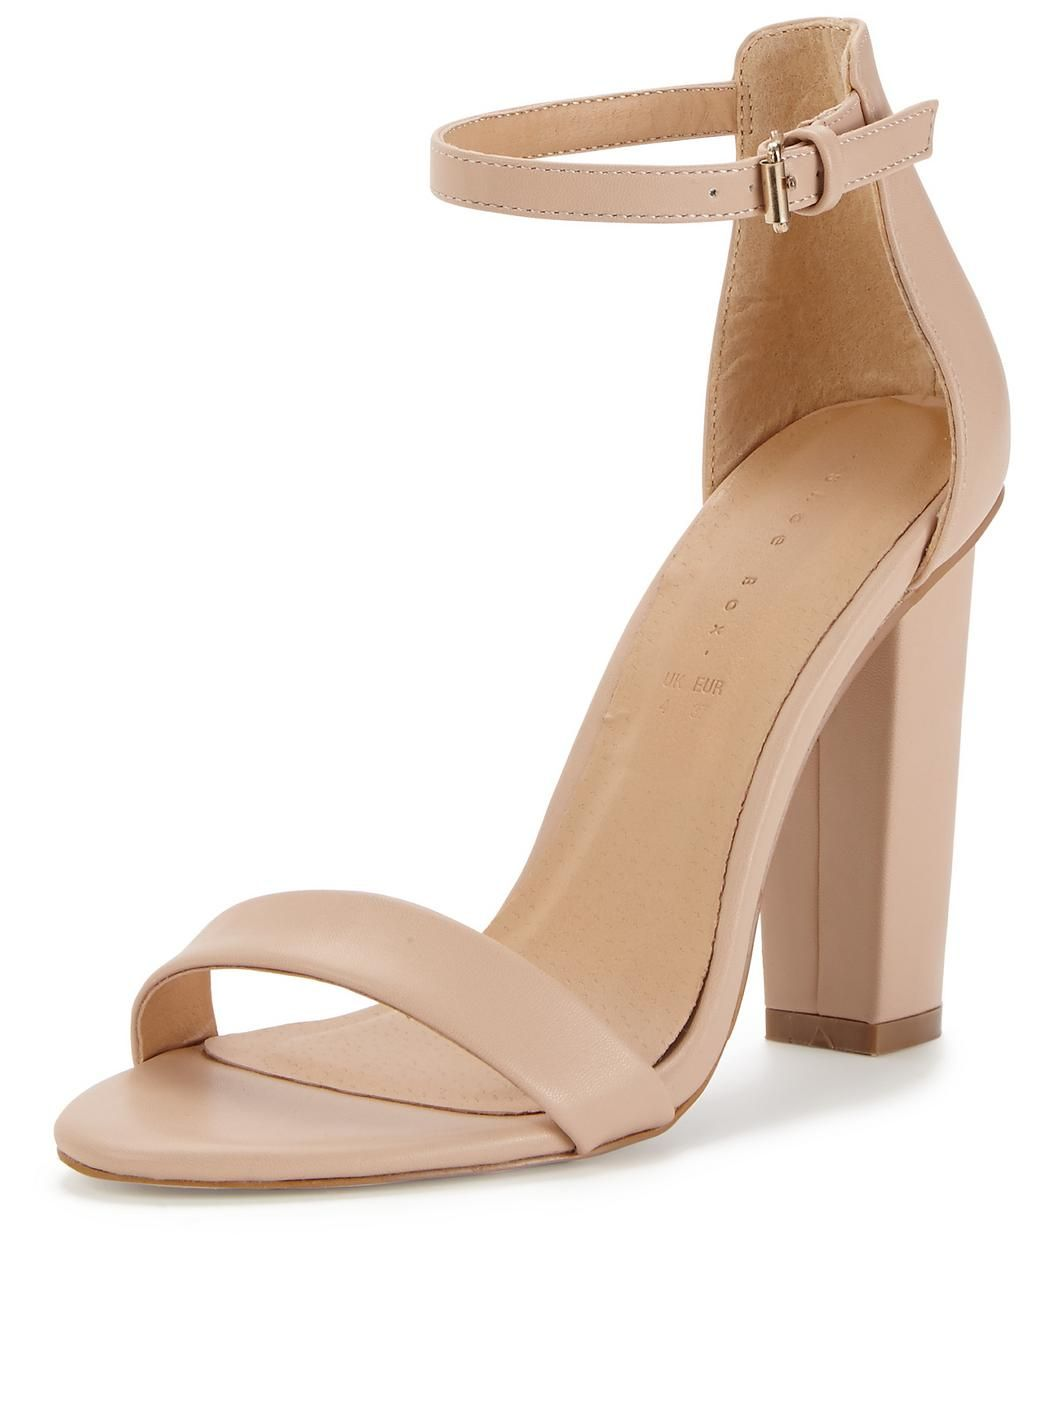 Nude Block Heel Sandals | Flat shoes, Flats and Summer